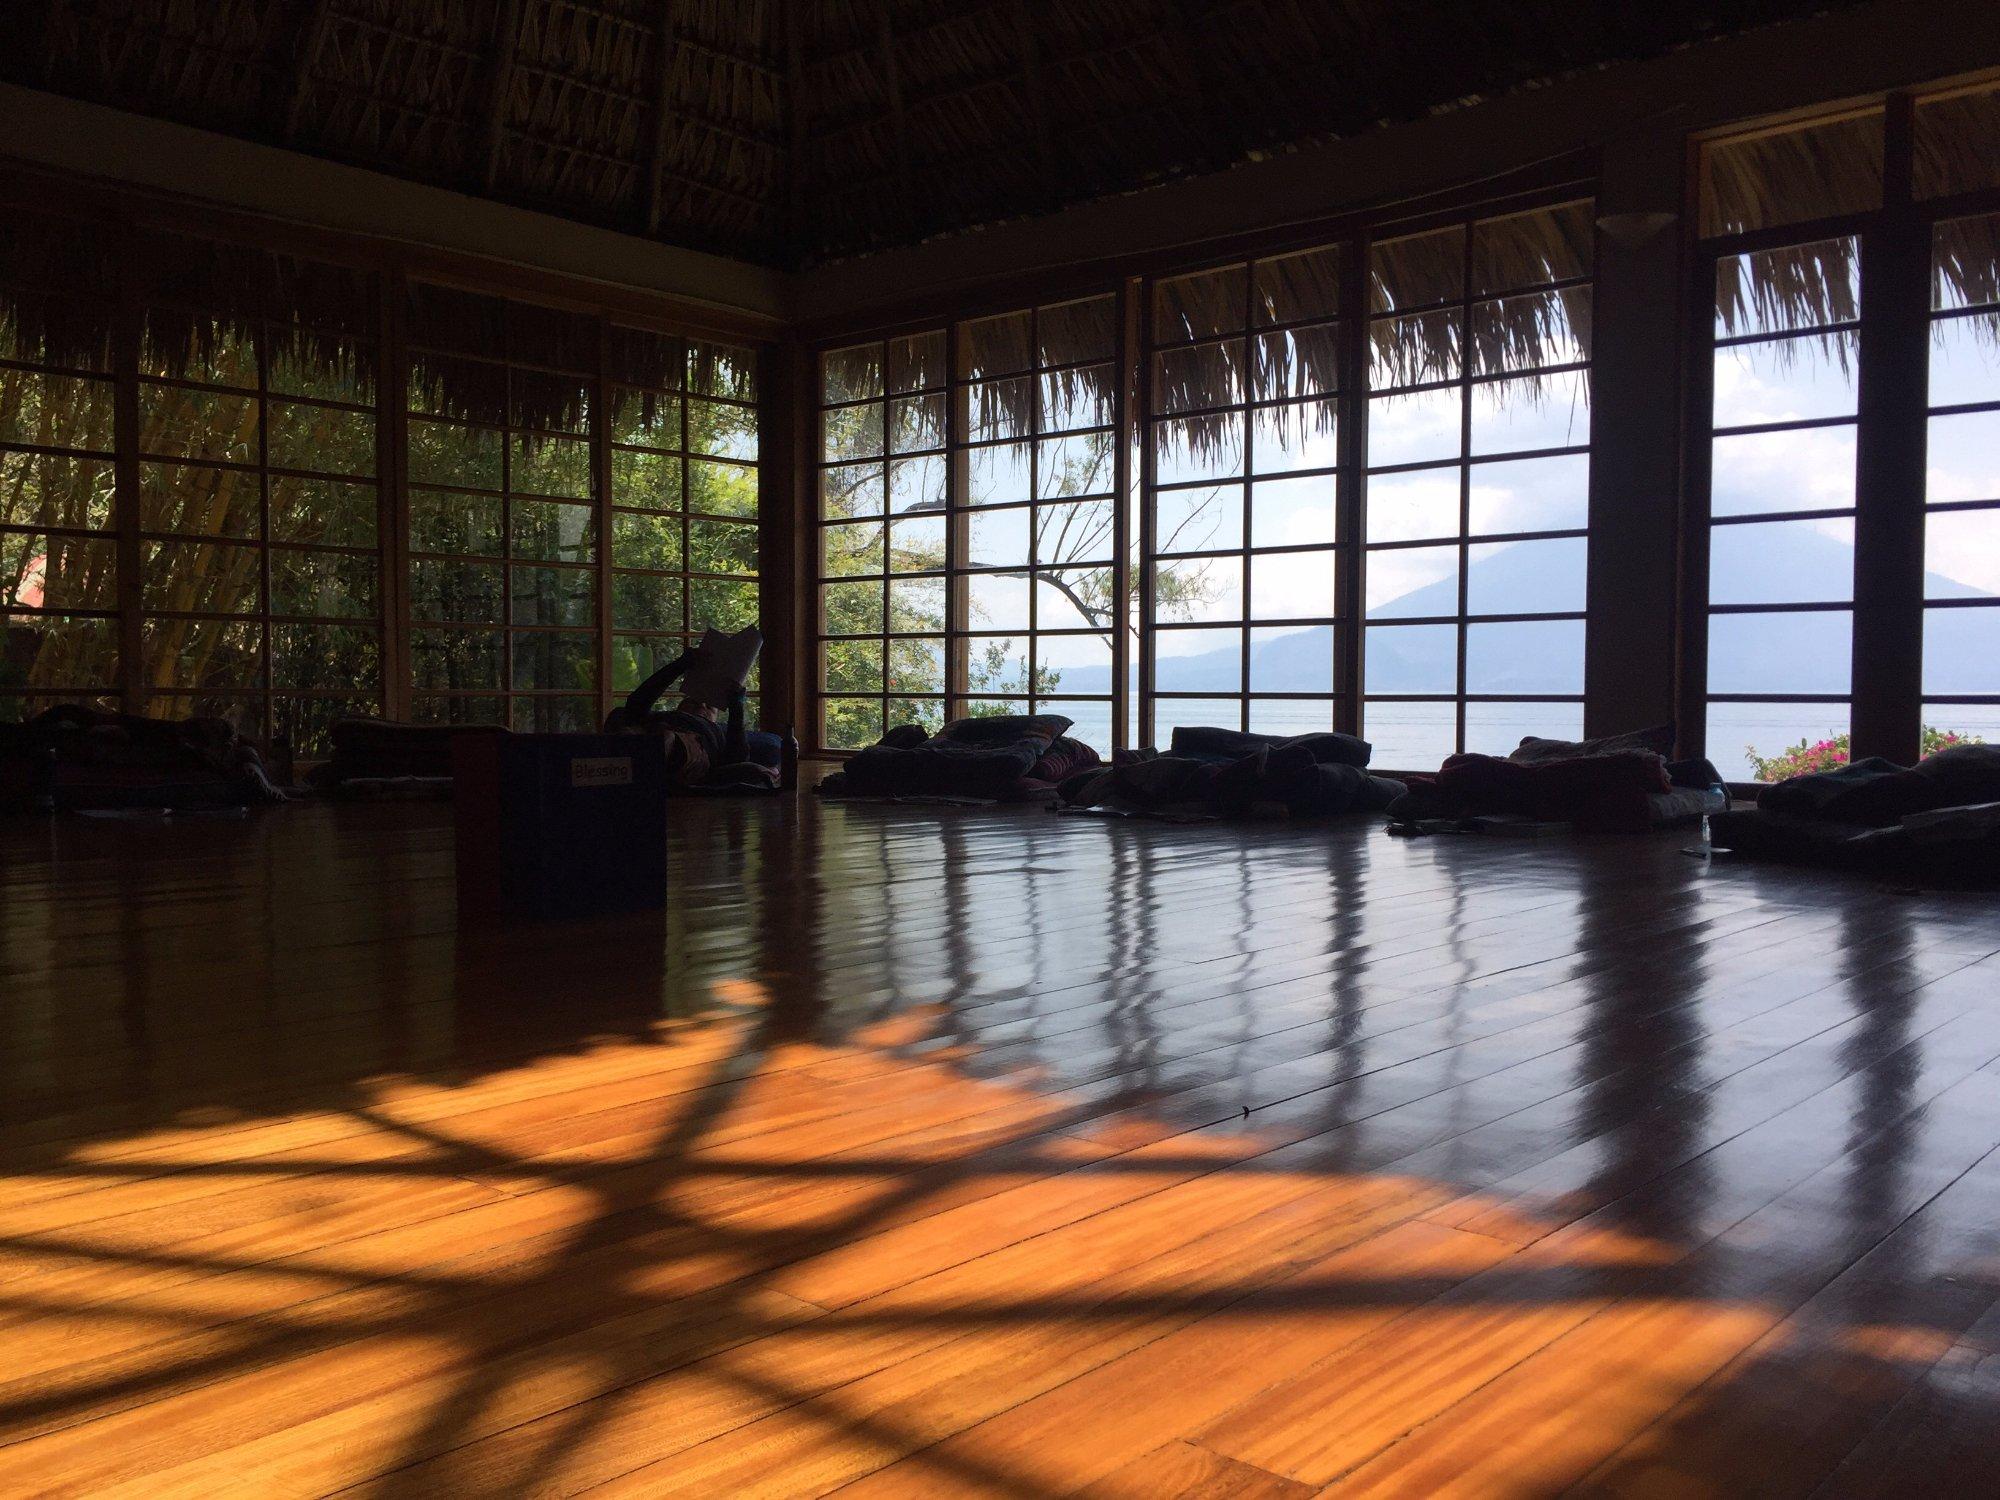 SACRED SPIRIT YOGA & MEDITATION RETREAT - Lago de Atitlan, GuatemalaNovember 3 - 10th, 2018